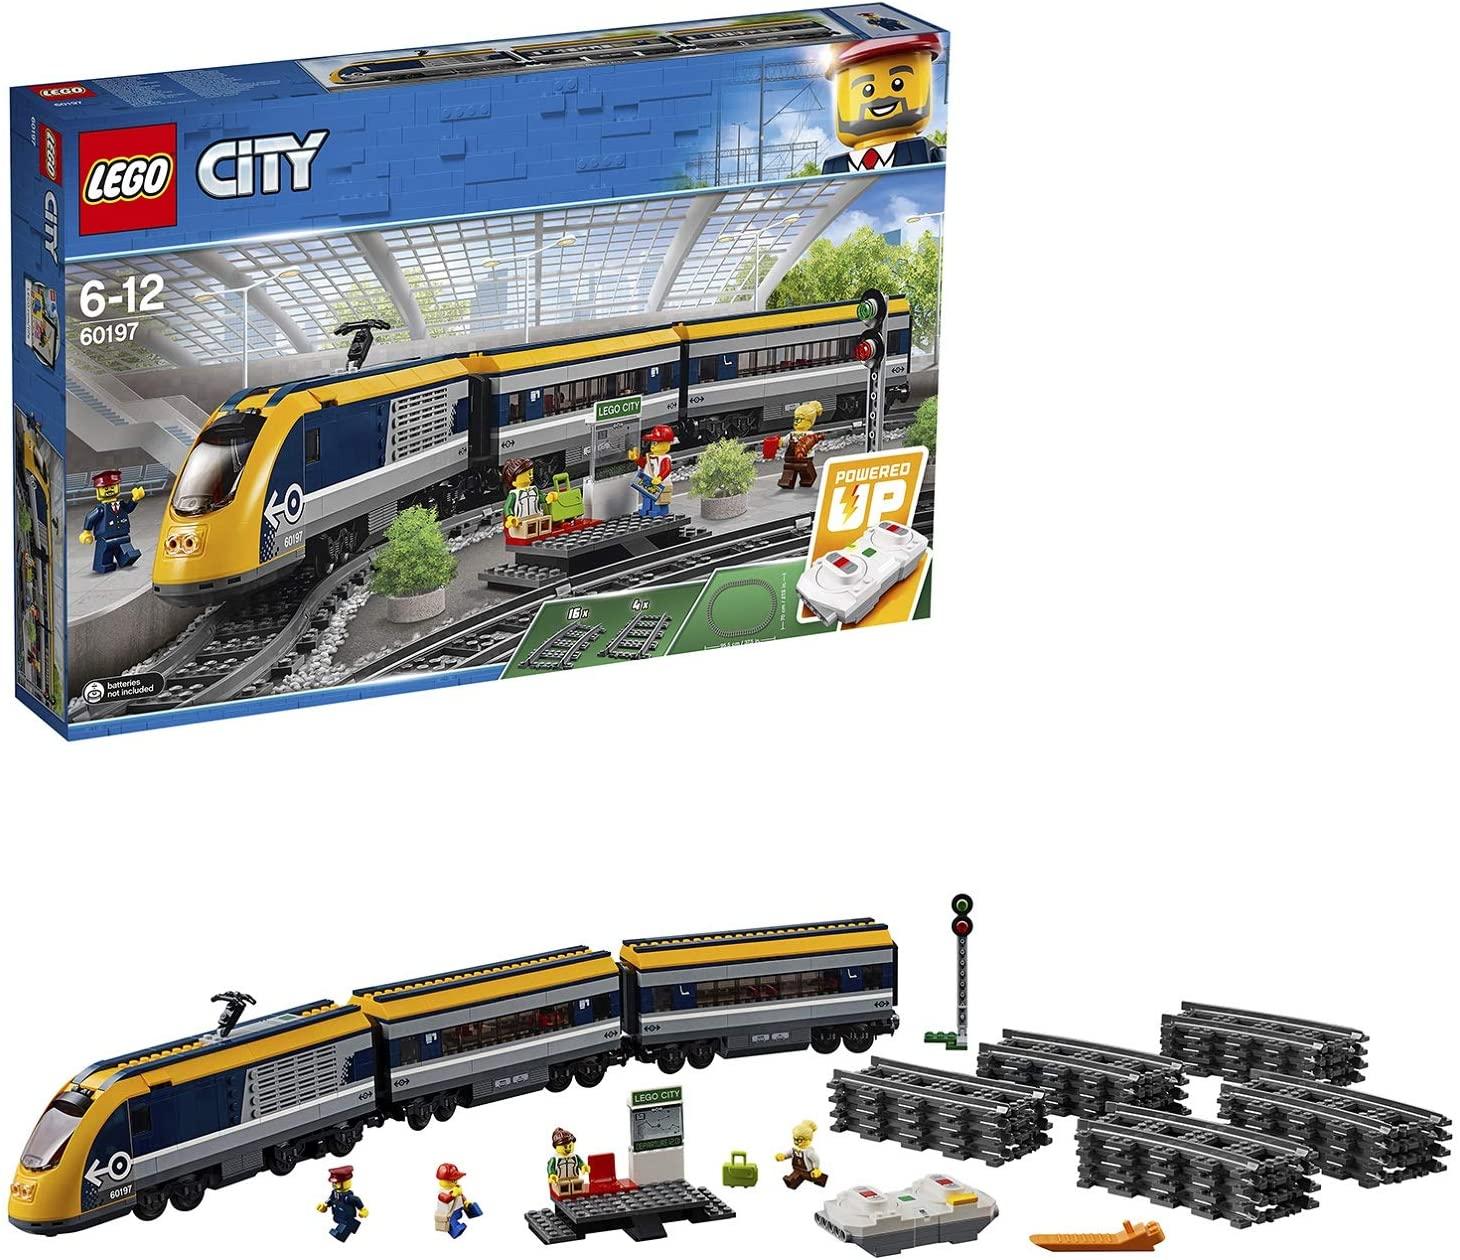 Lego City Tren de pasajeros solo 71.4€